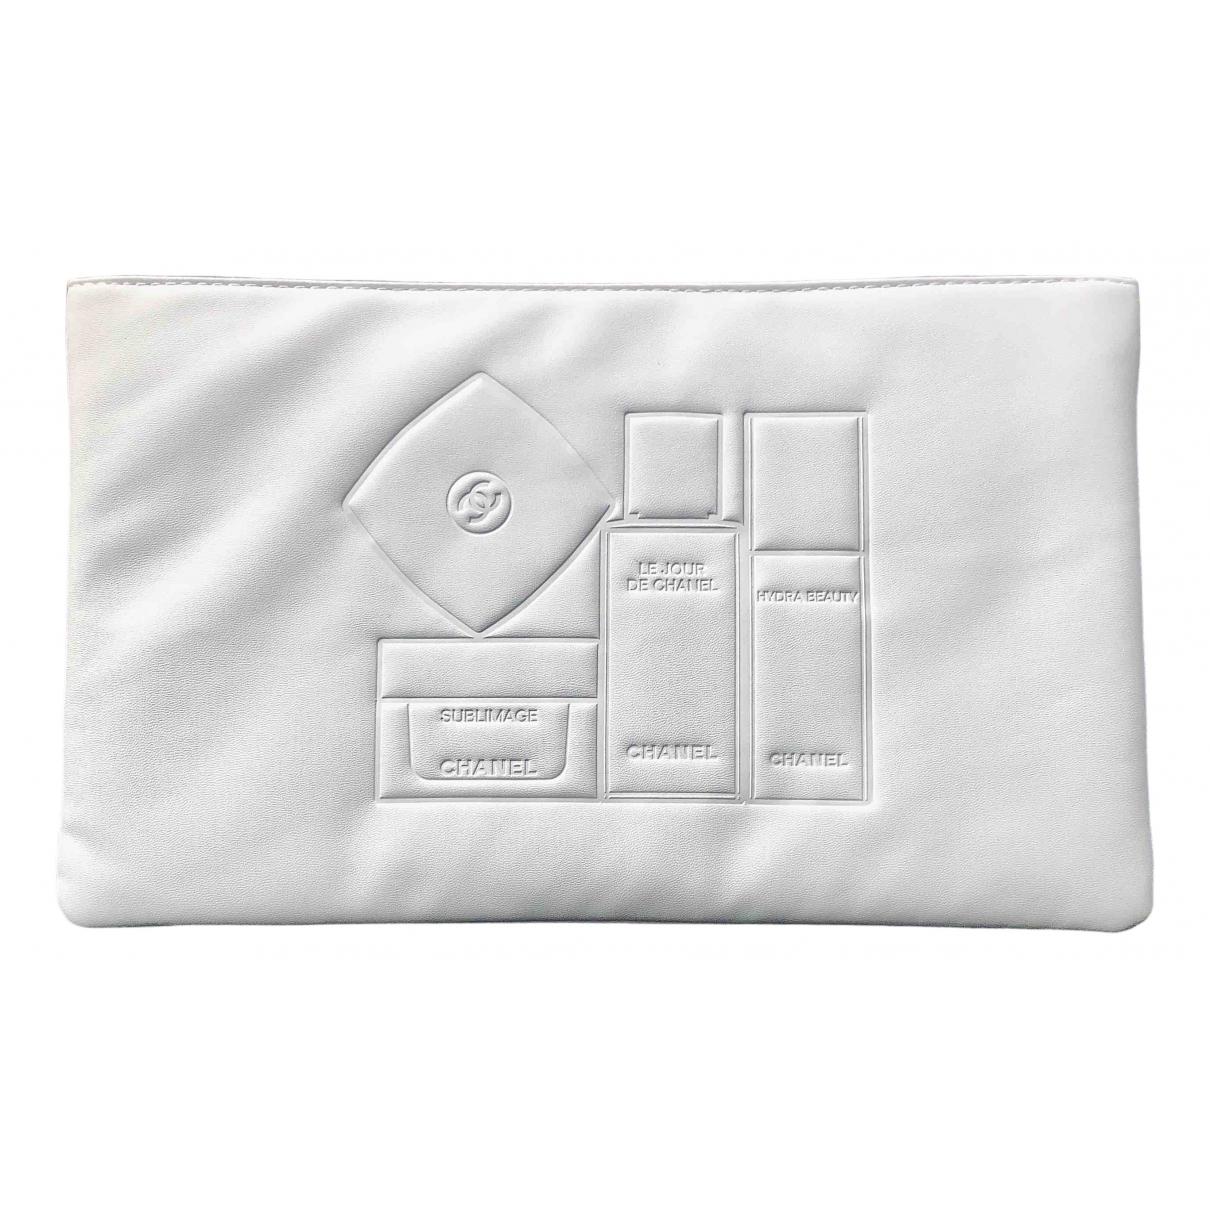 Chanel \N White Clutch bag for Women \N